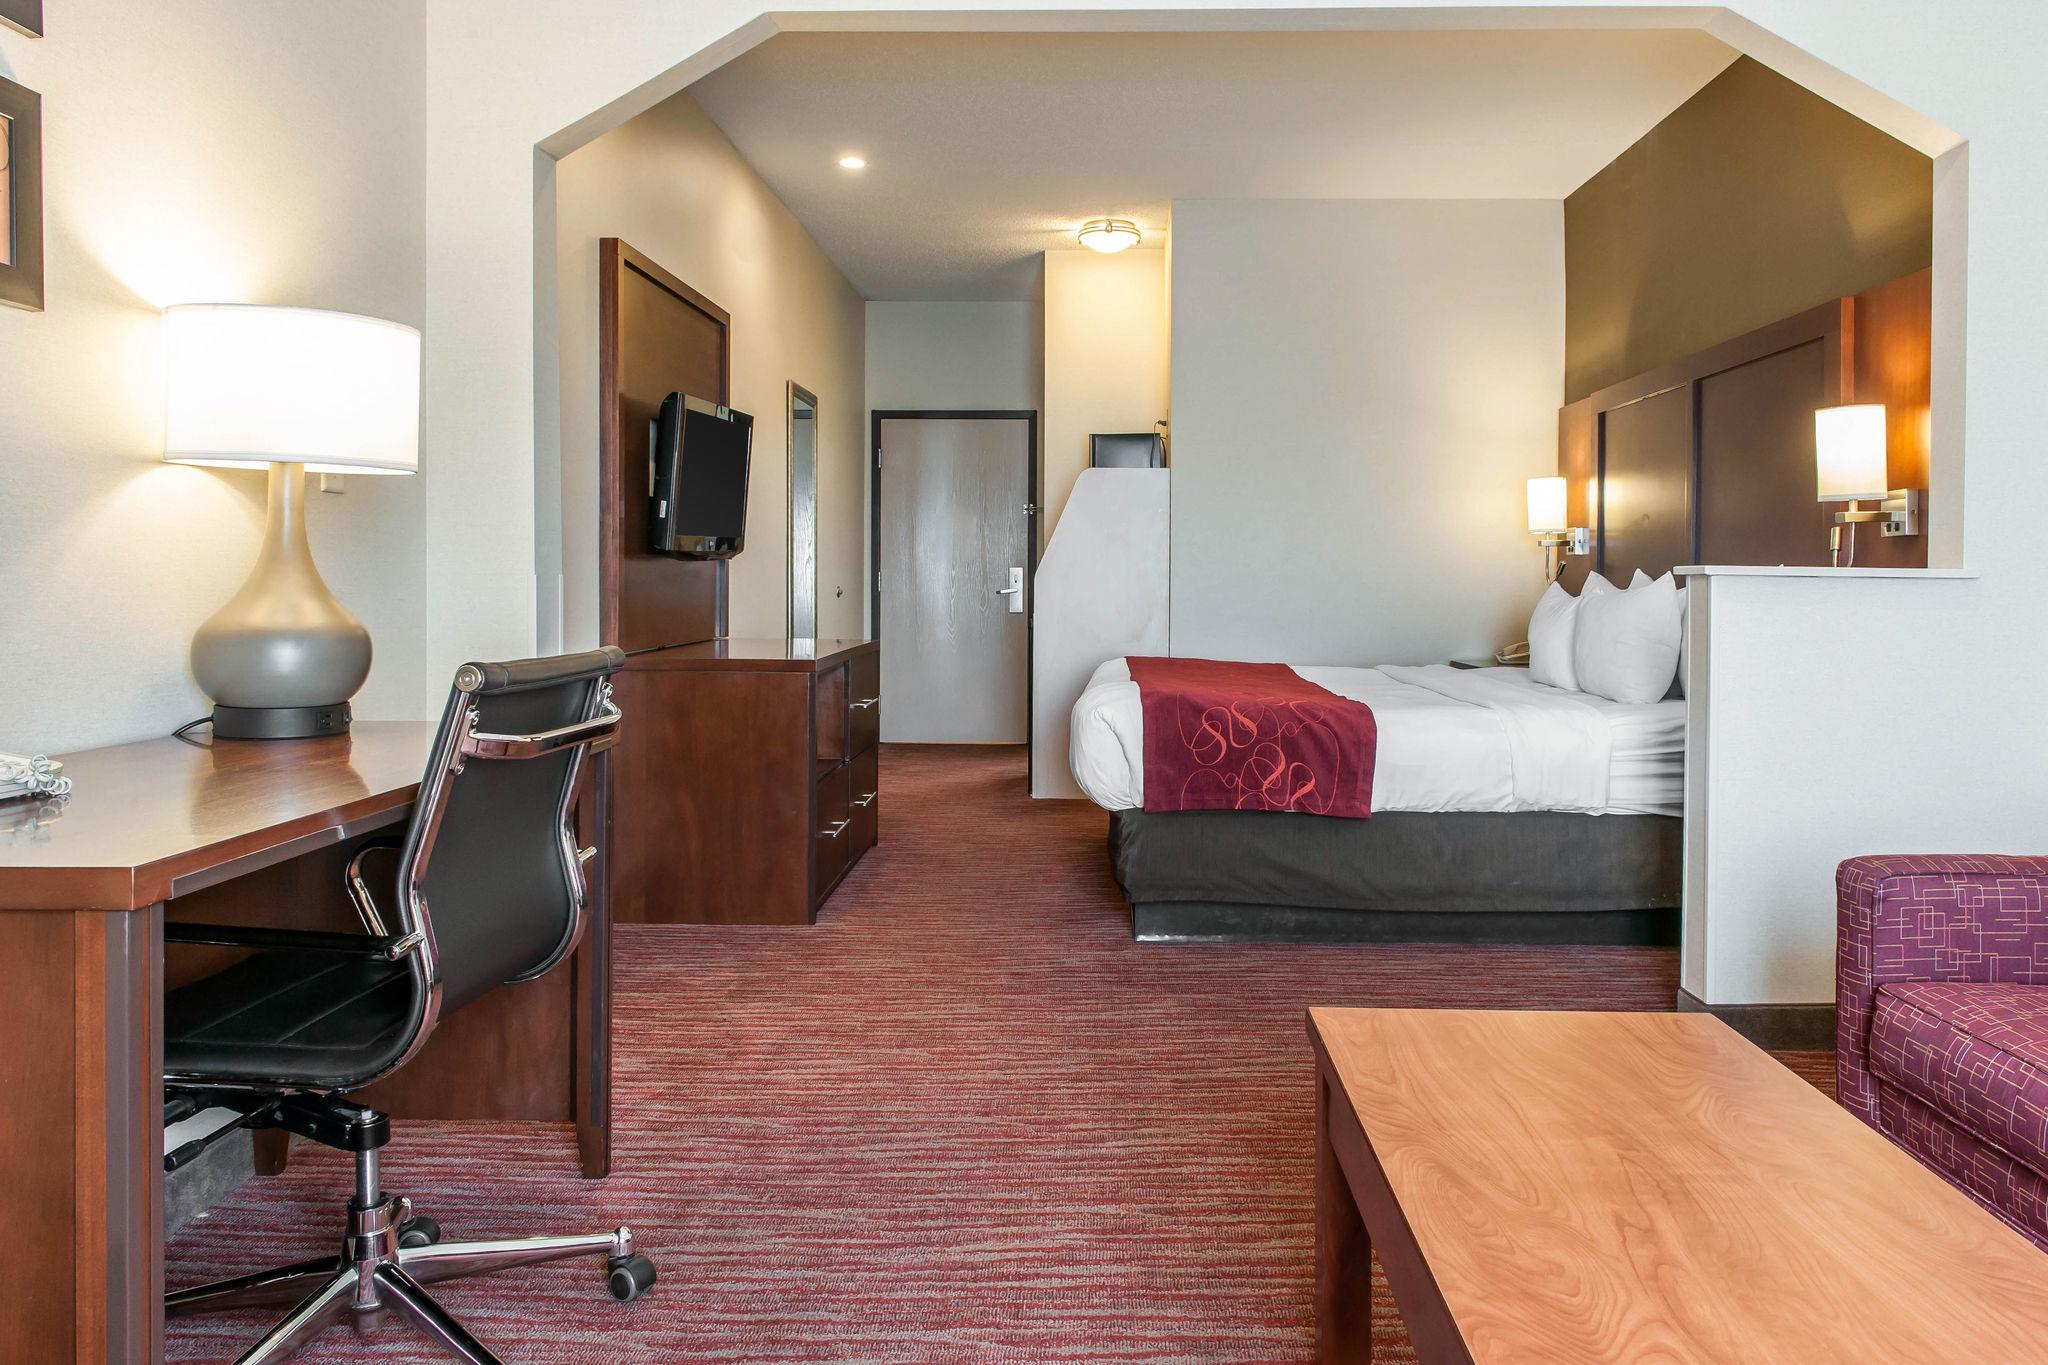 Фото отеля baymont inn and suites columbus north 3